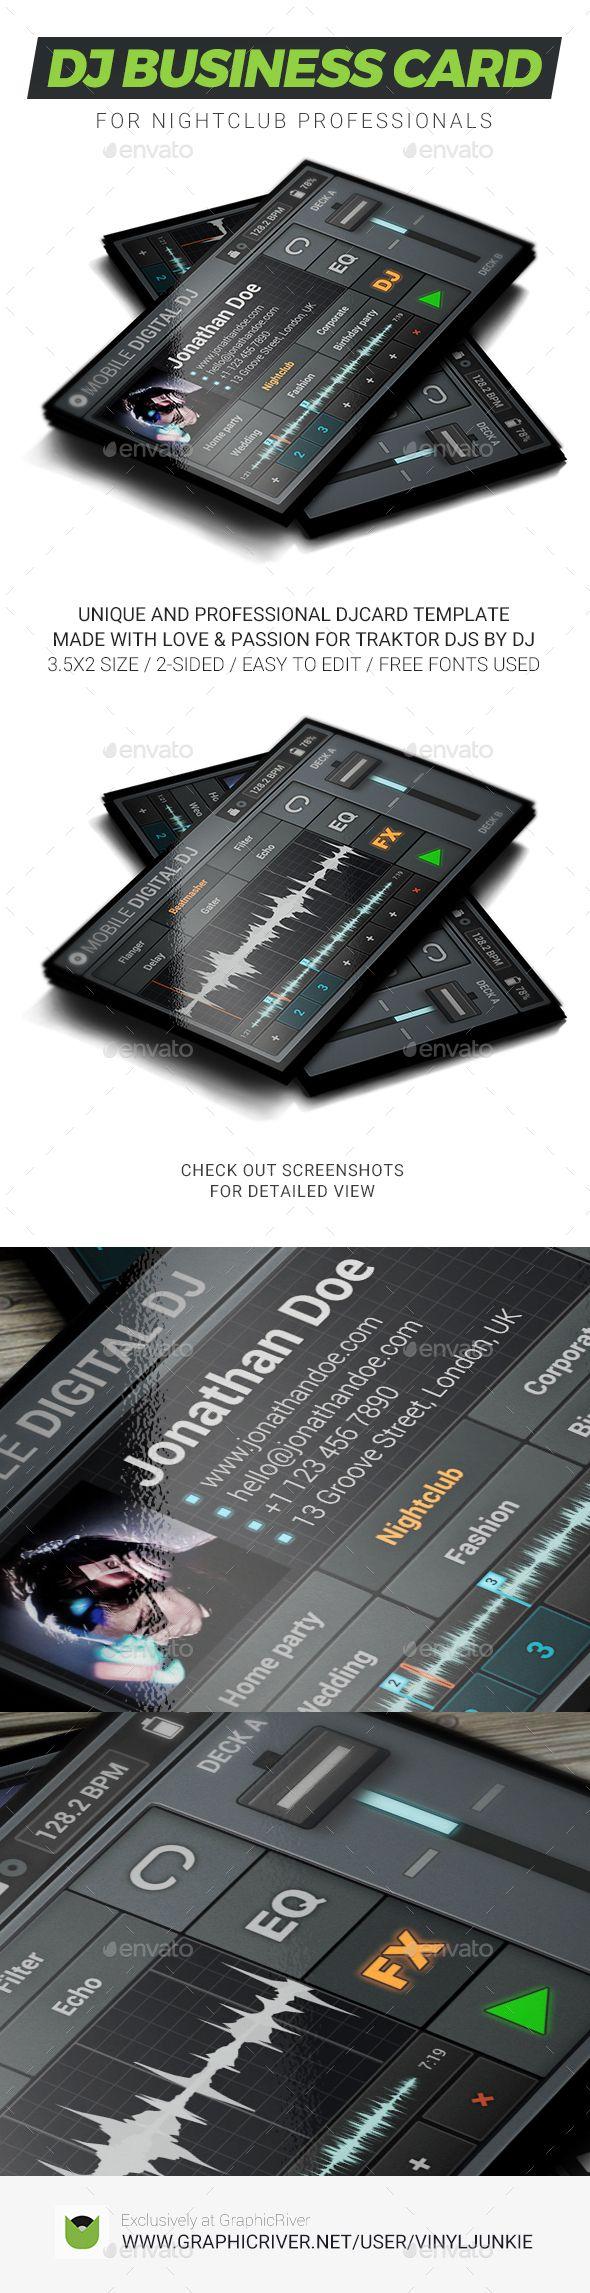 Mobile Digital DJ Business Card | Dj business cards, Business ...